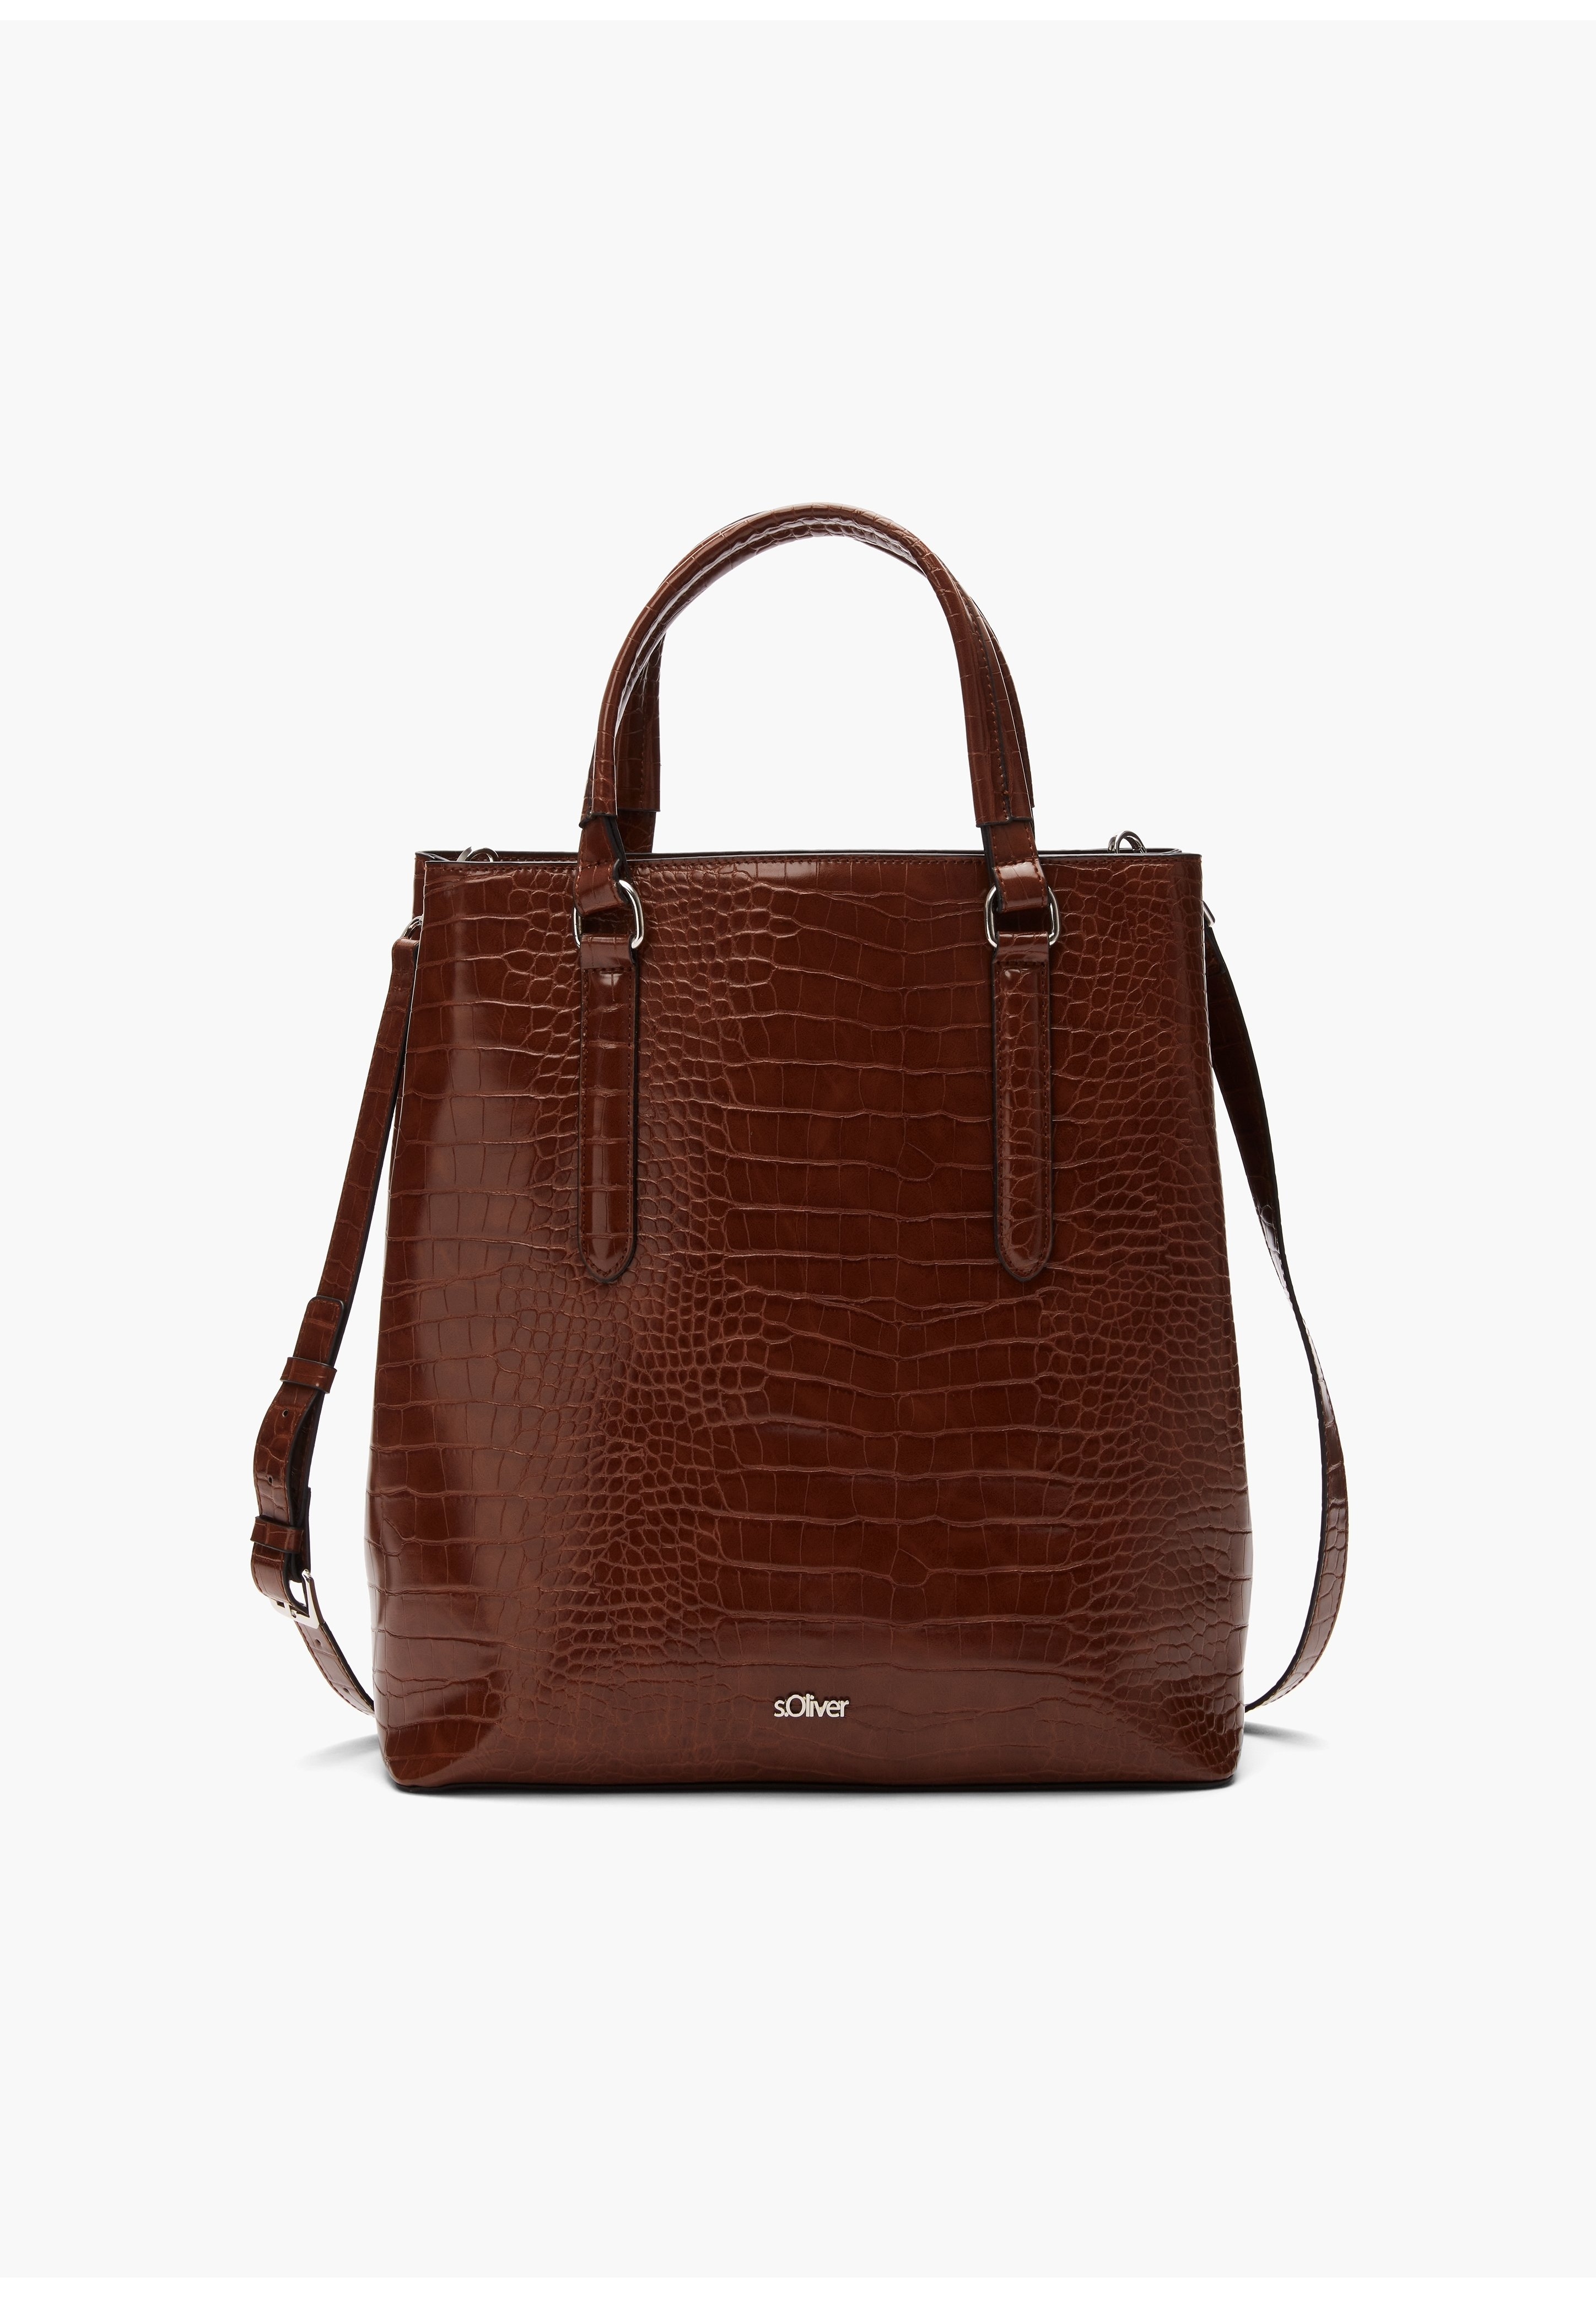 S.oliver Shopping Bag - Cognac/braun